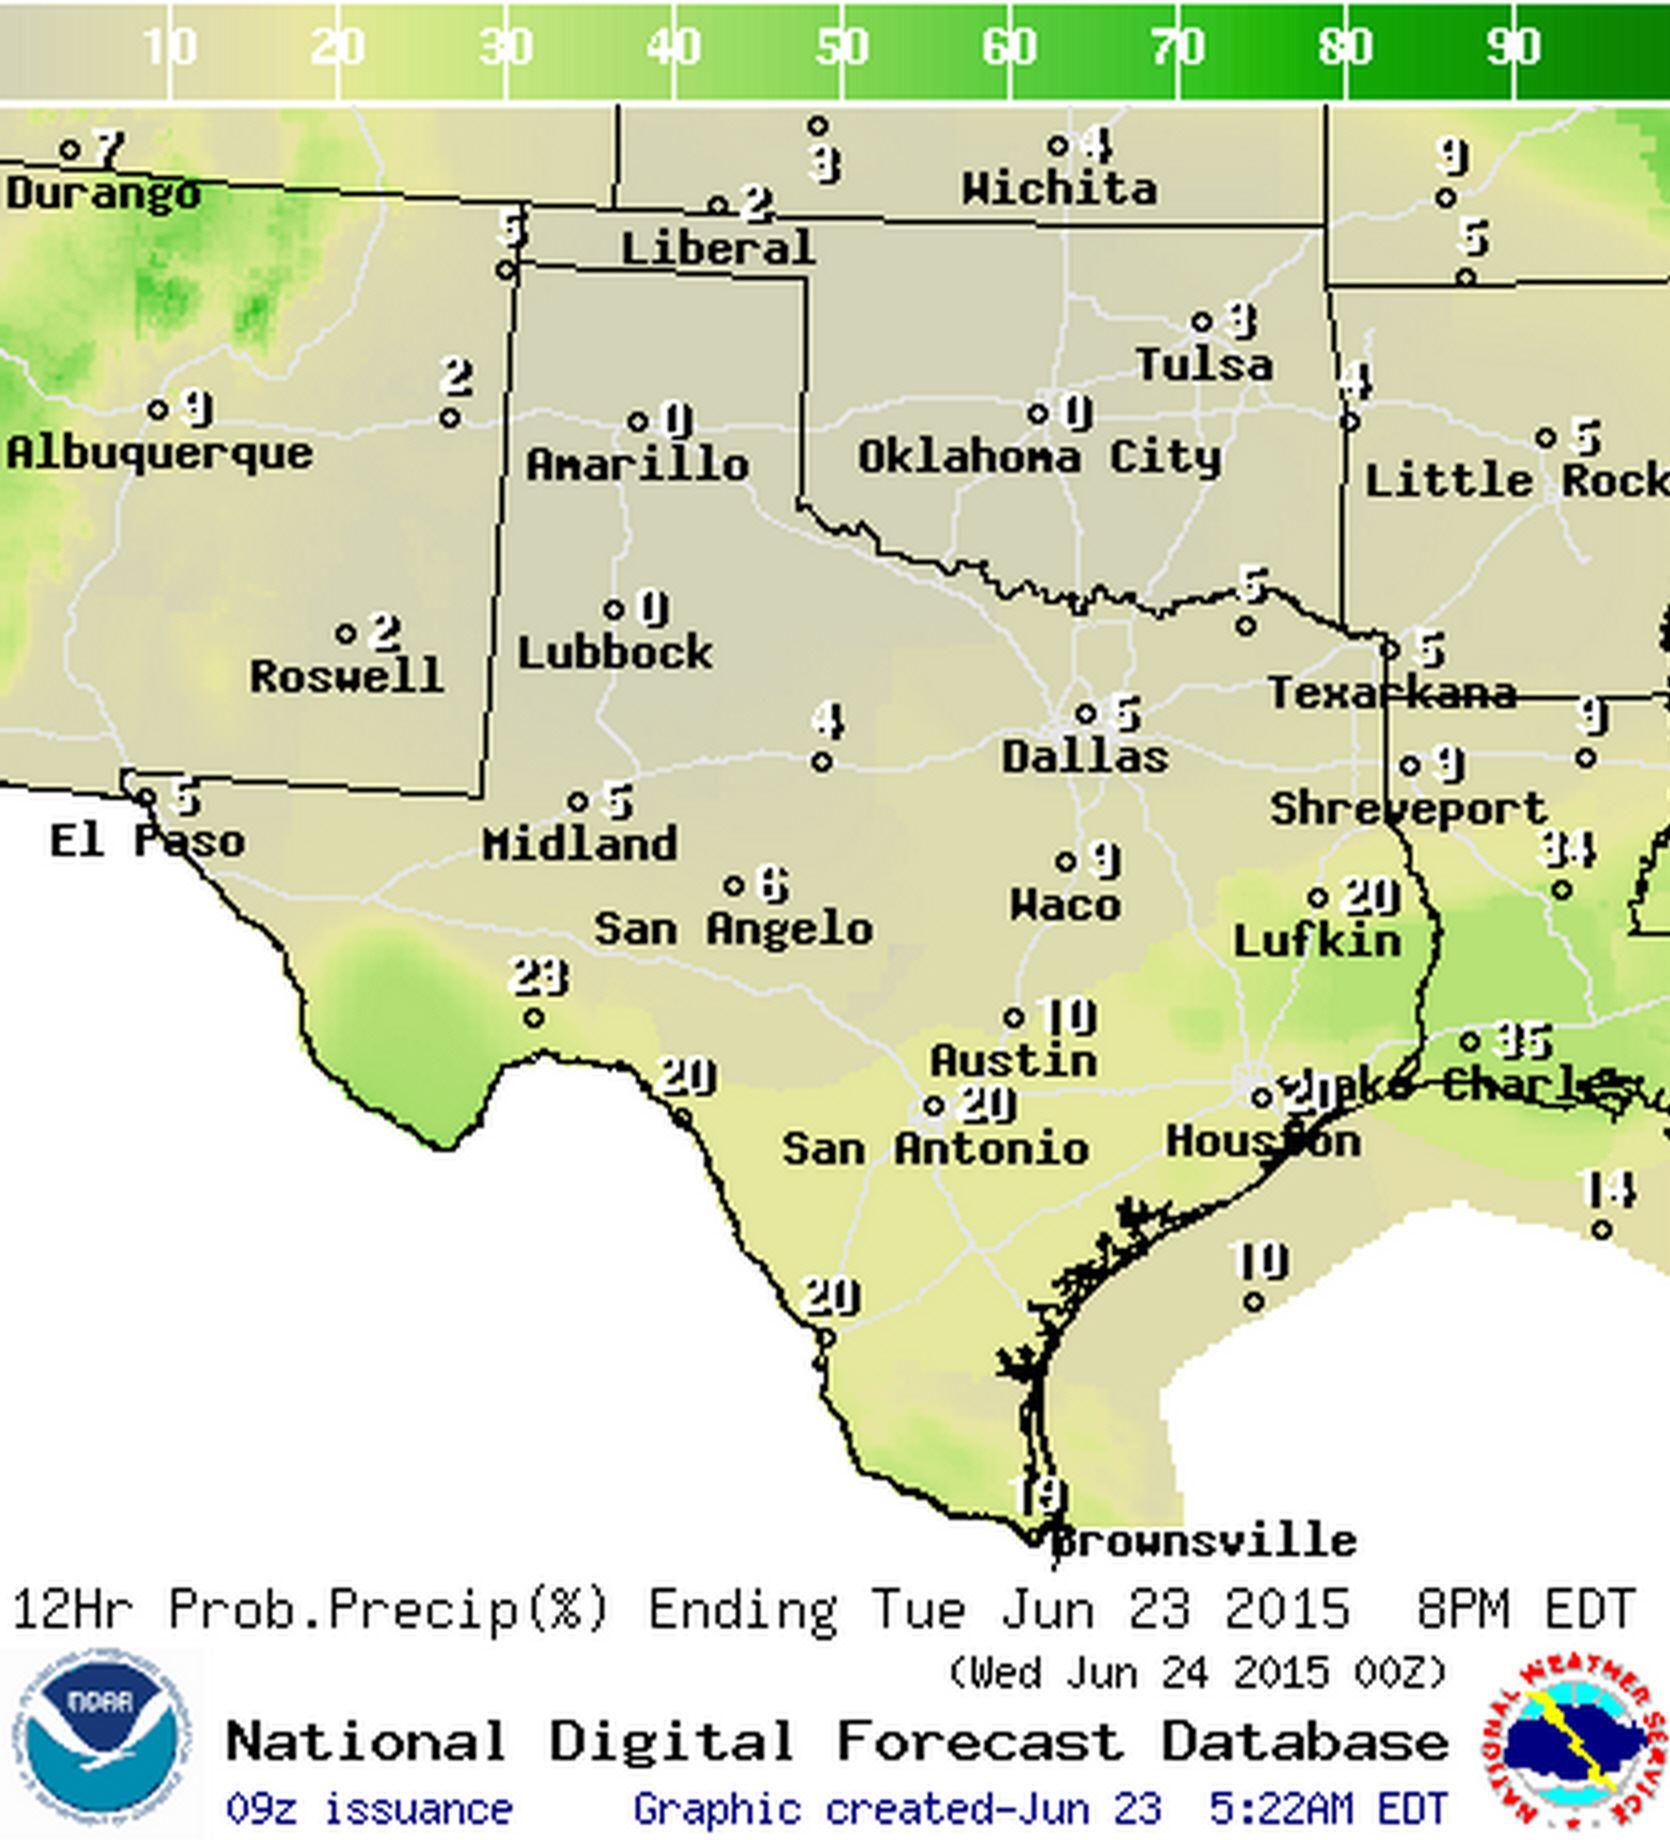 Chance of rain today (%)